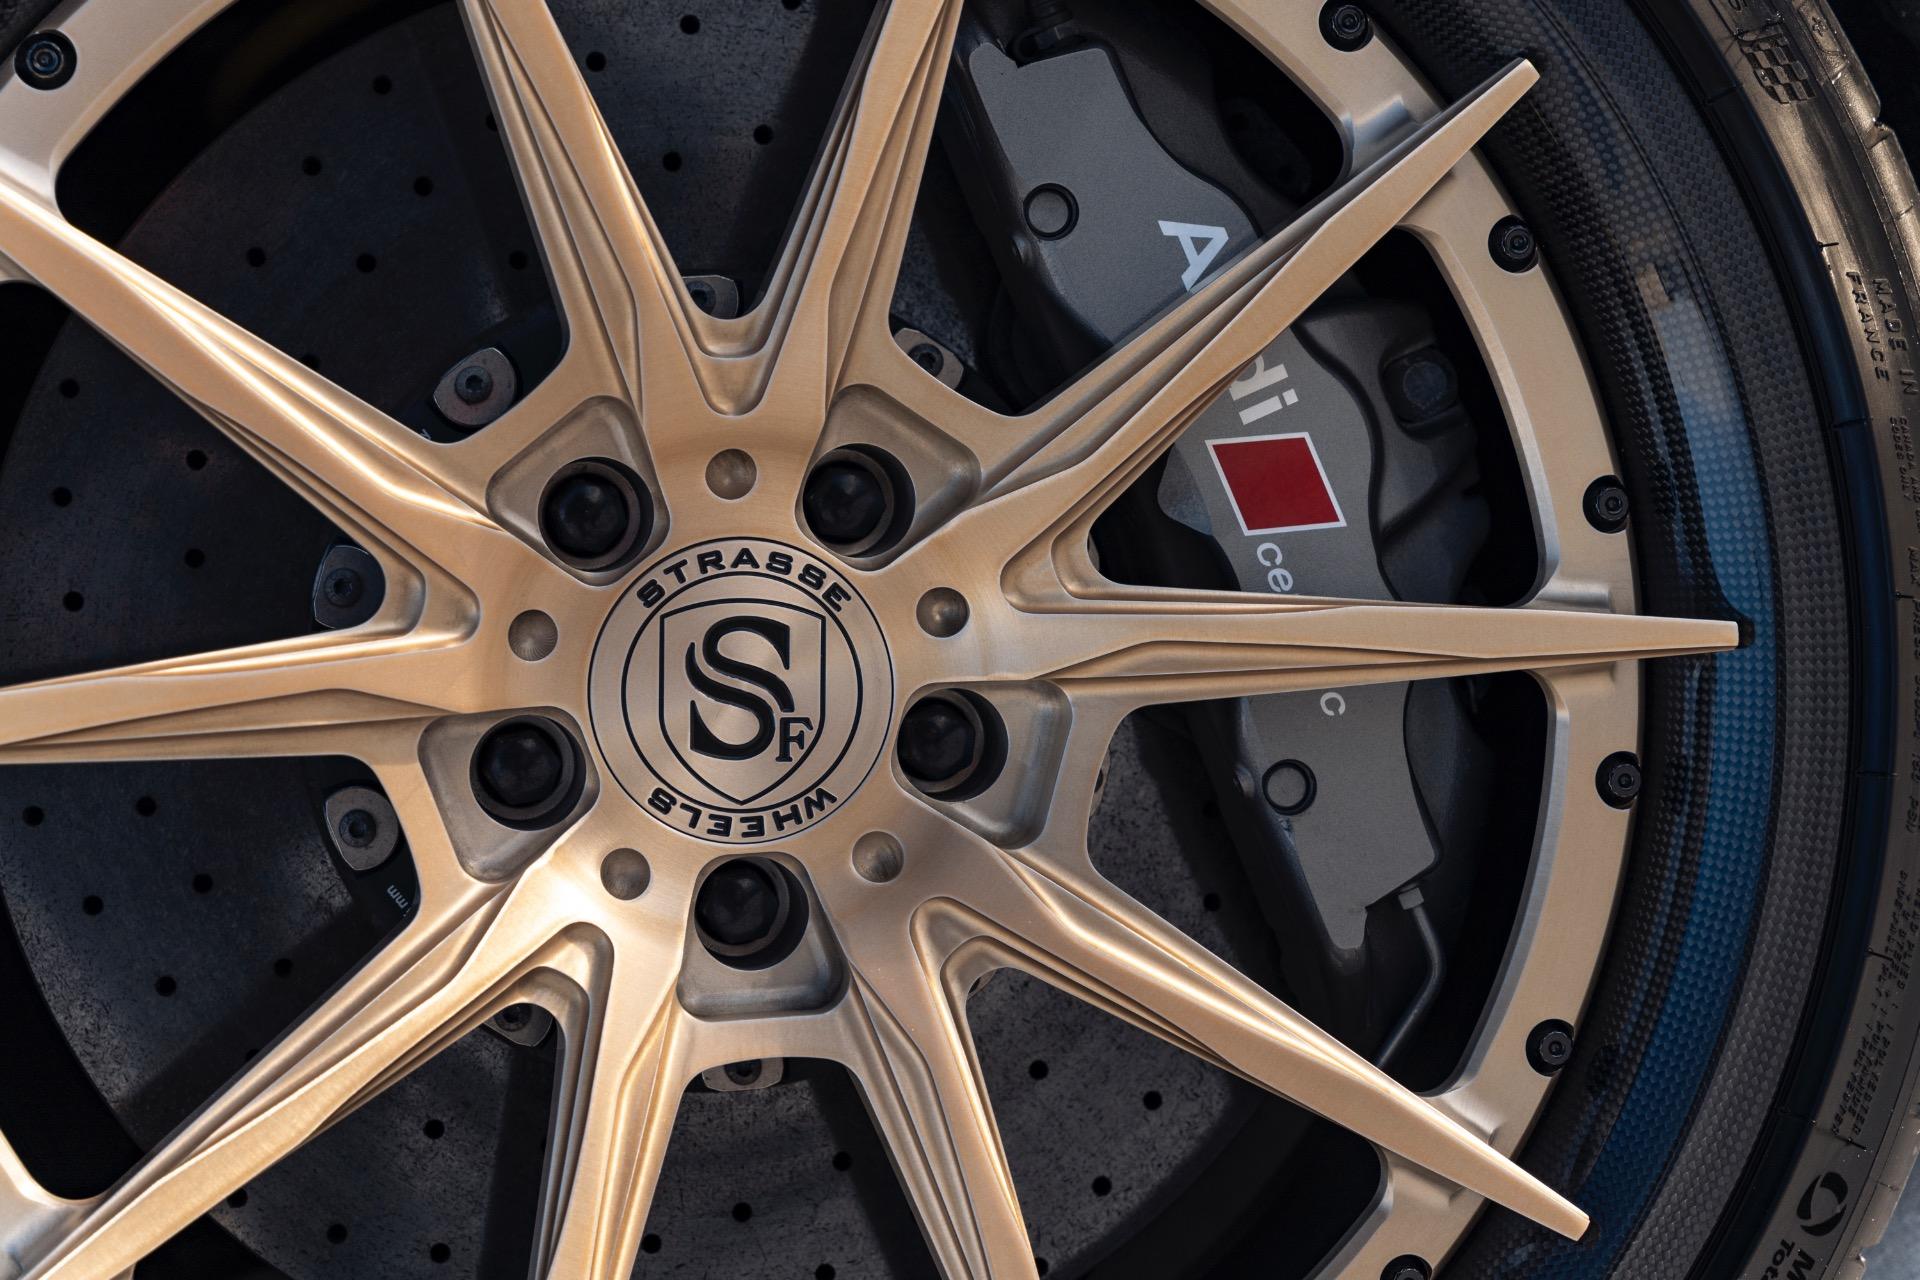 Used-2017-Audi-R8-52-quattro-V10-Plus-FI-Exhaust-Diamond-Stitching